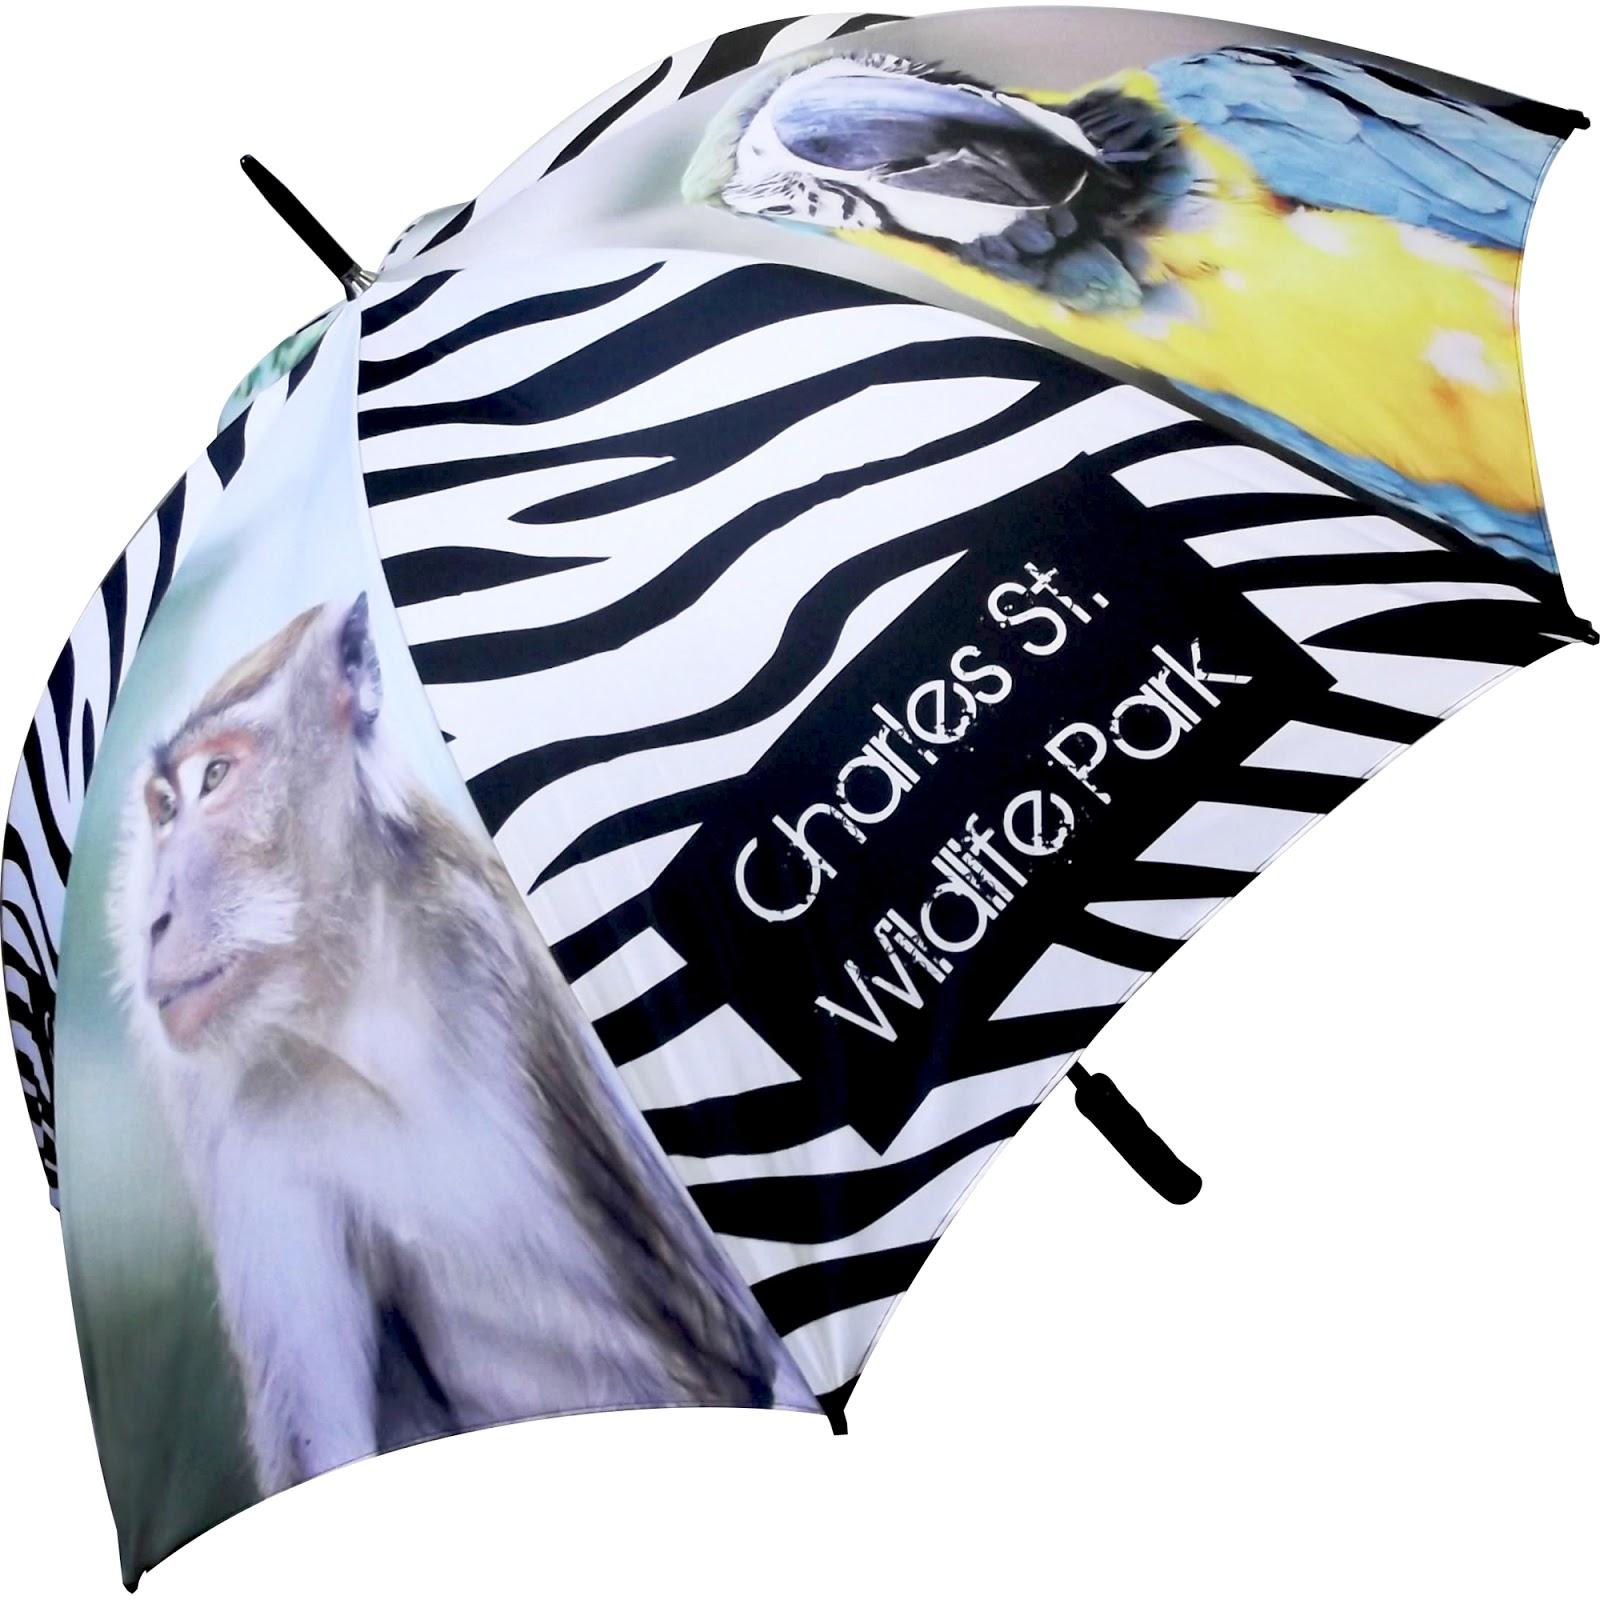 Bespoke Printed Golf Umbrellas